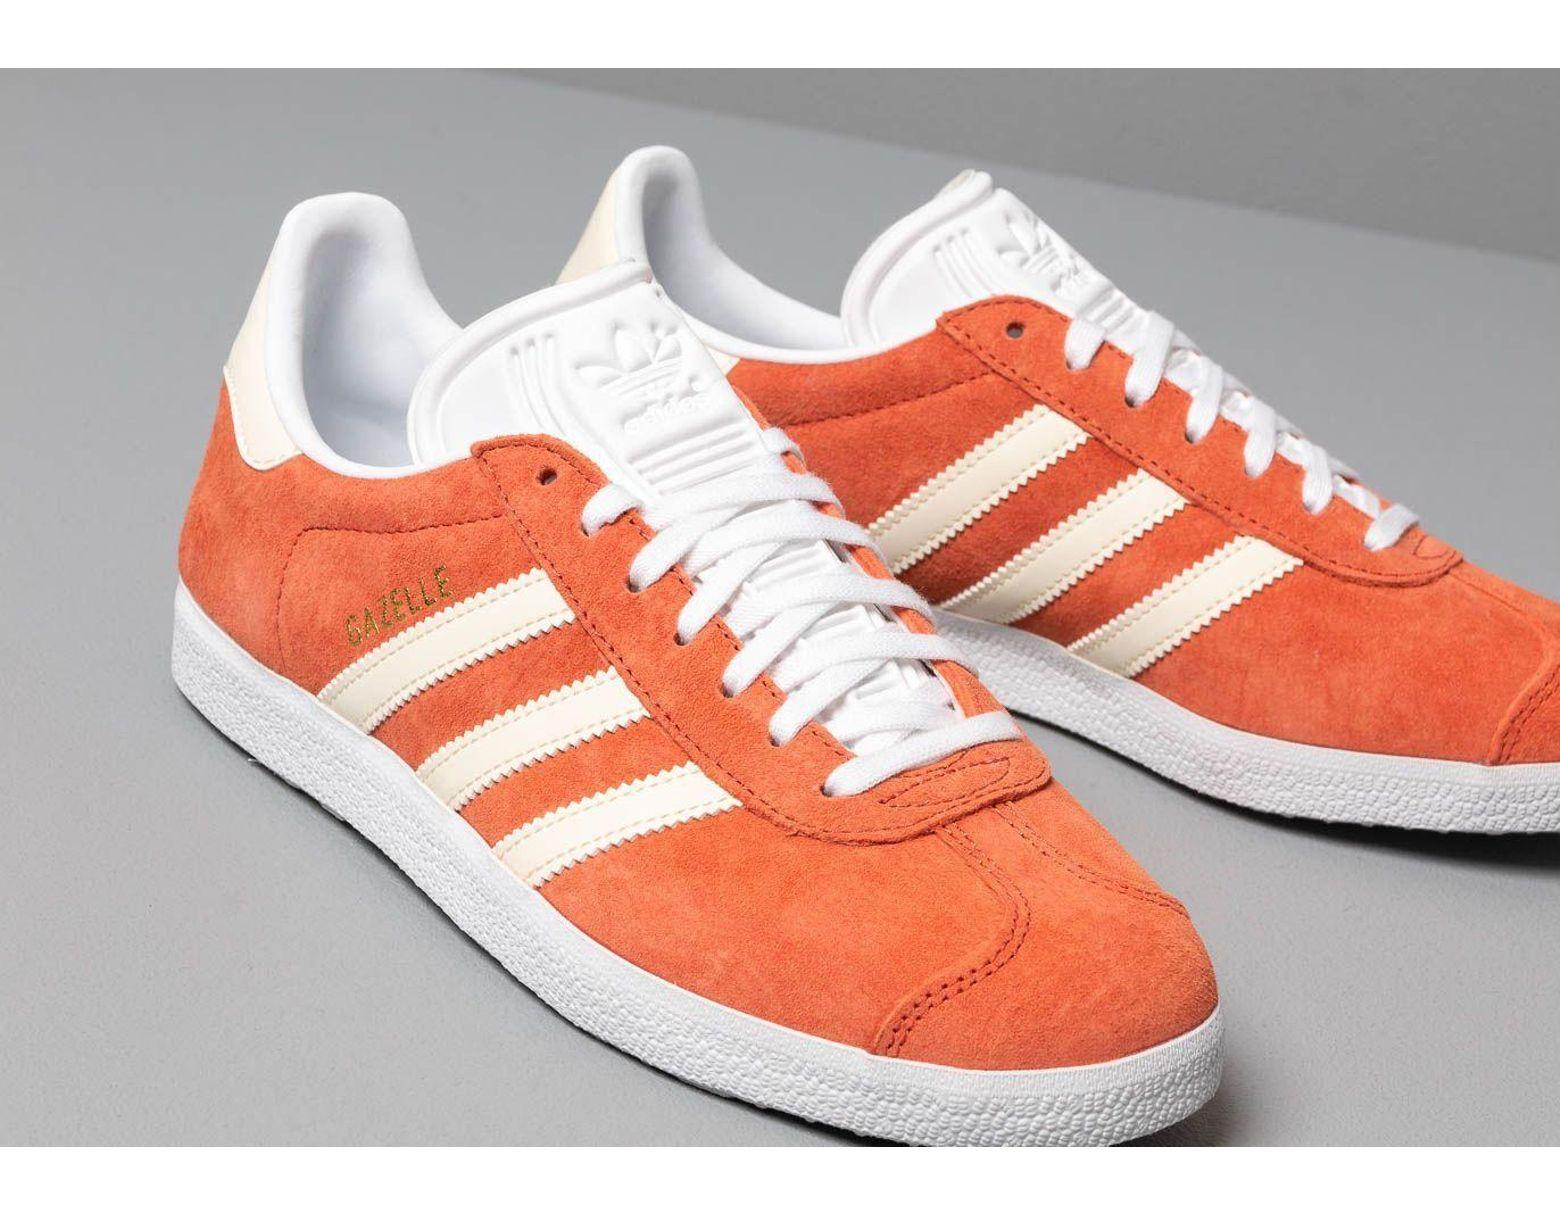 dcc978a87e4 adidas-originals-Red-Adidas-Gazelle-W-Raw-Amber-Ecru-Tint-Ftw-White.jpeg